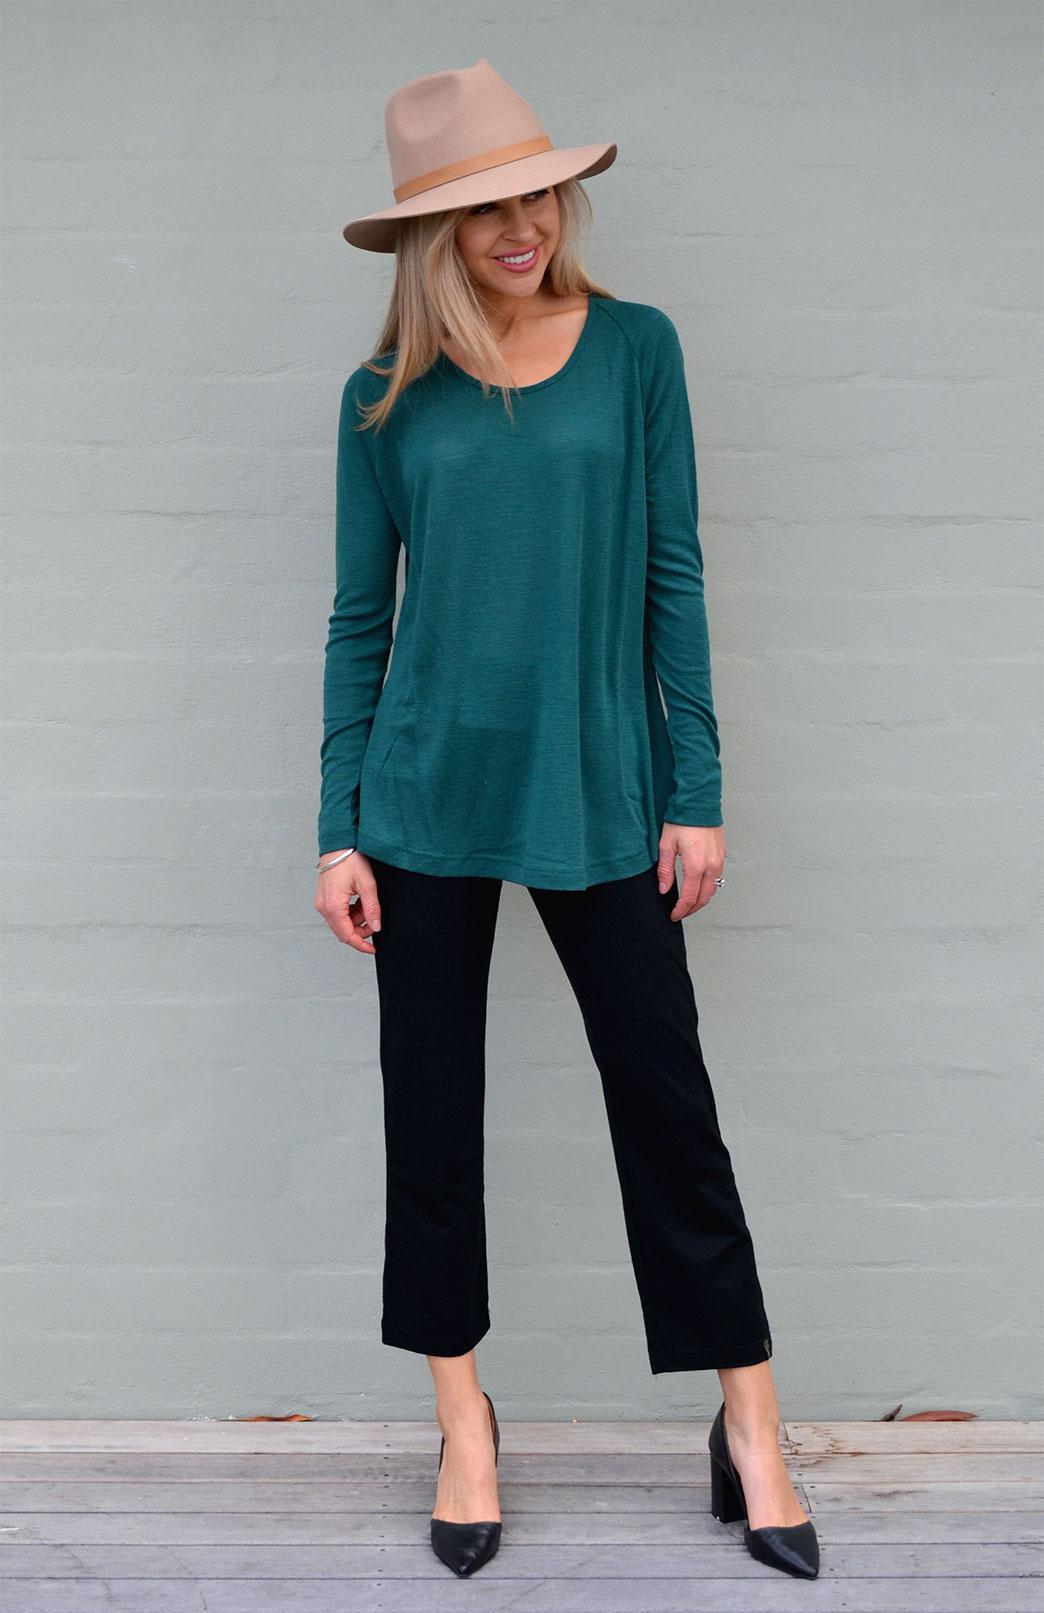 Rana Top - Women's Emerald Green Pure Merino Wool Top with Long Sleeves, Scooped Neckline and Curved Hem - Smitten Merino Tasmania Australia